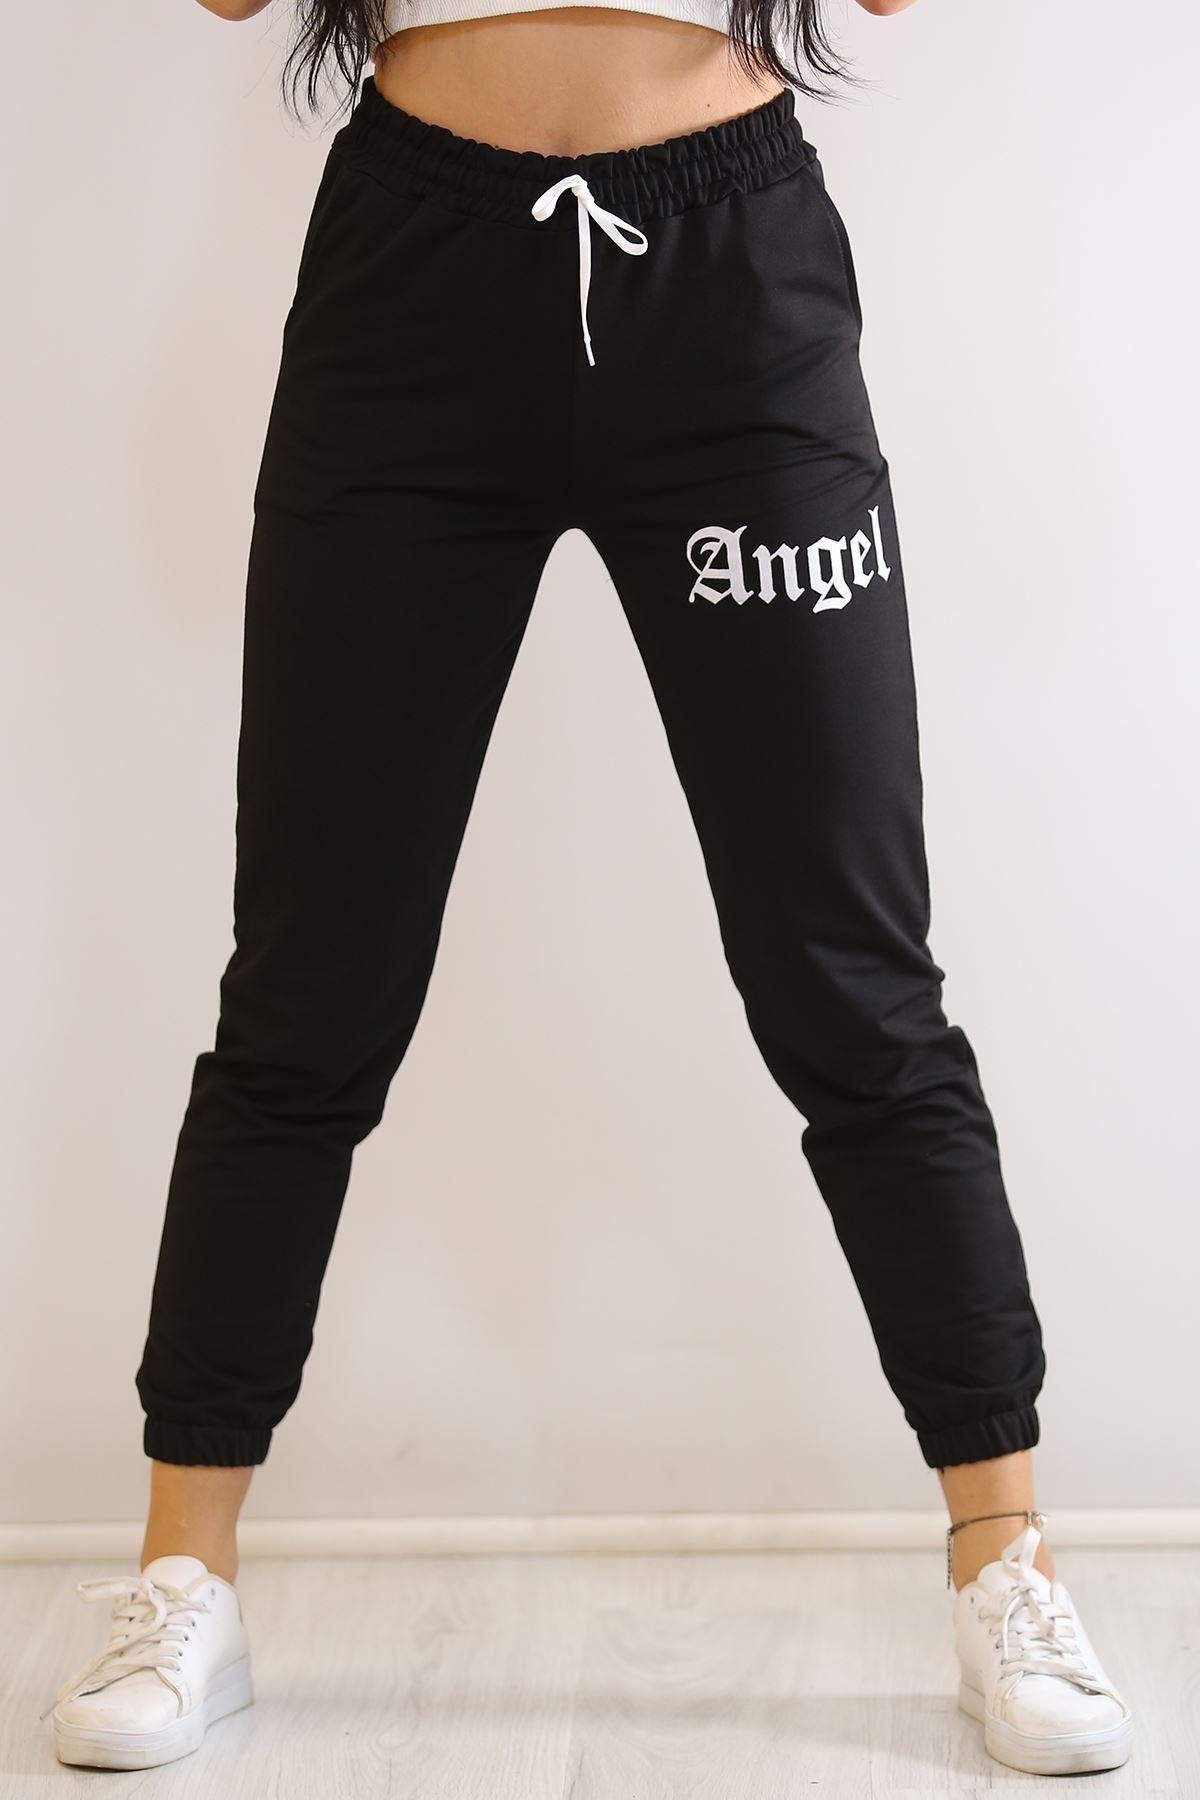 Angel Baskı Eşofman Altı Siyah - 7105.1357.